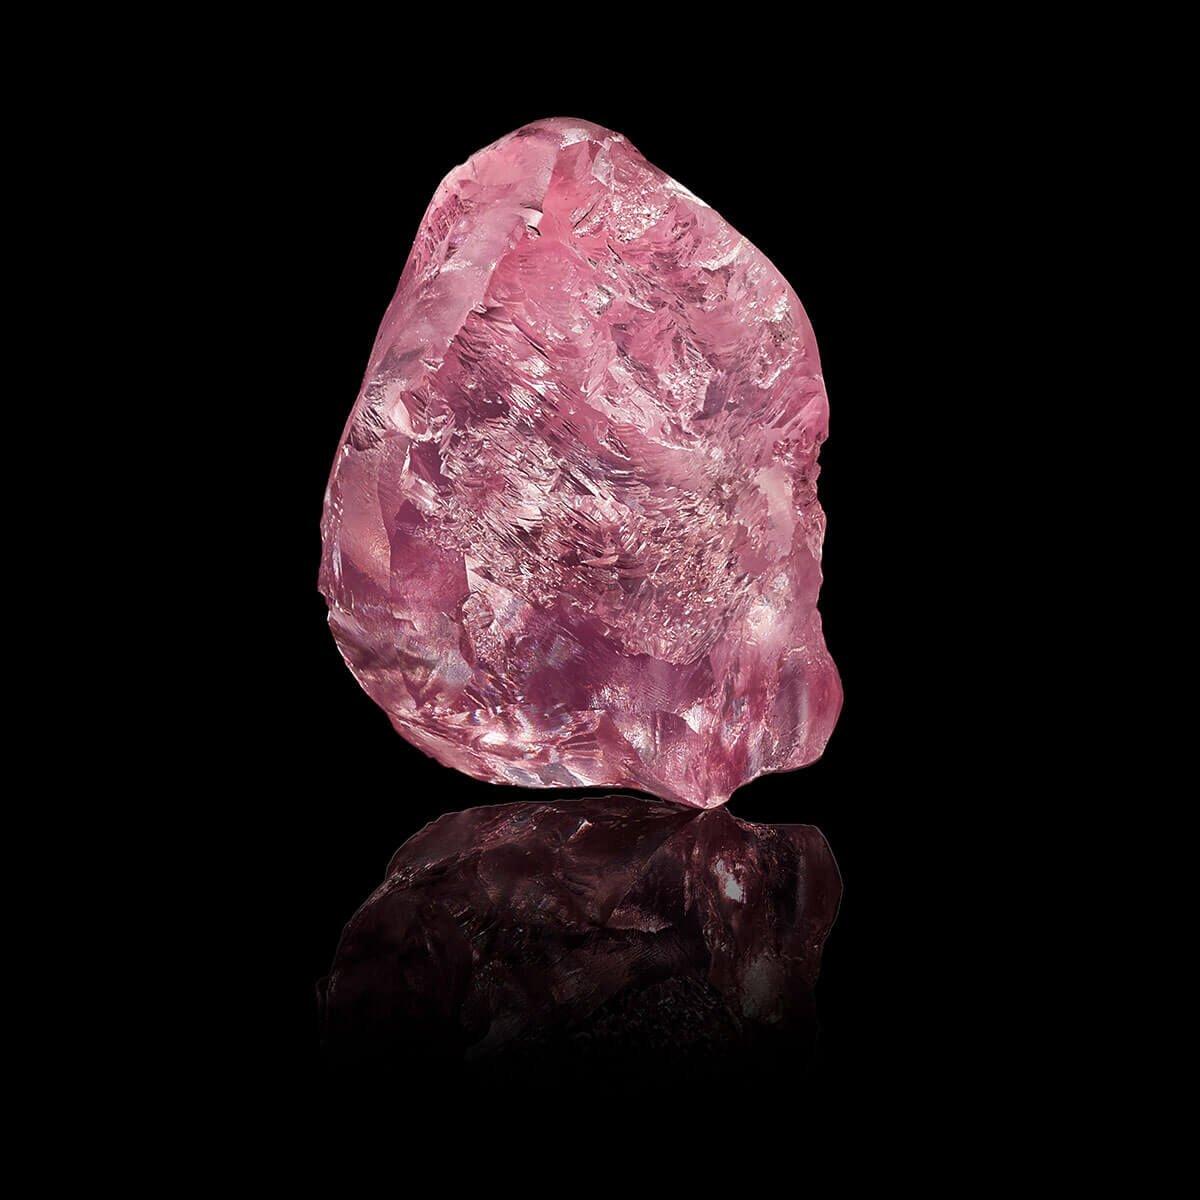 13.33 carat pink rough stone of the Graff Lesotho Pink Diamond